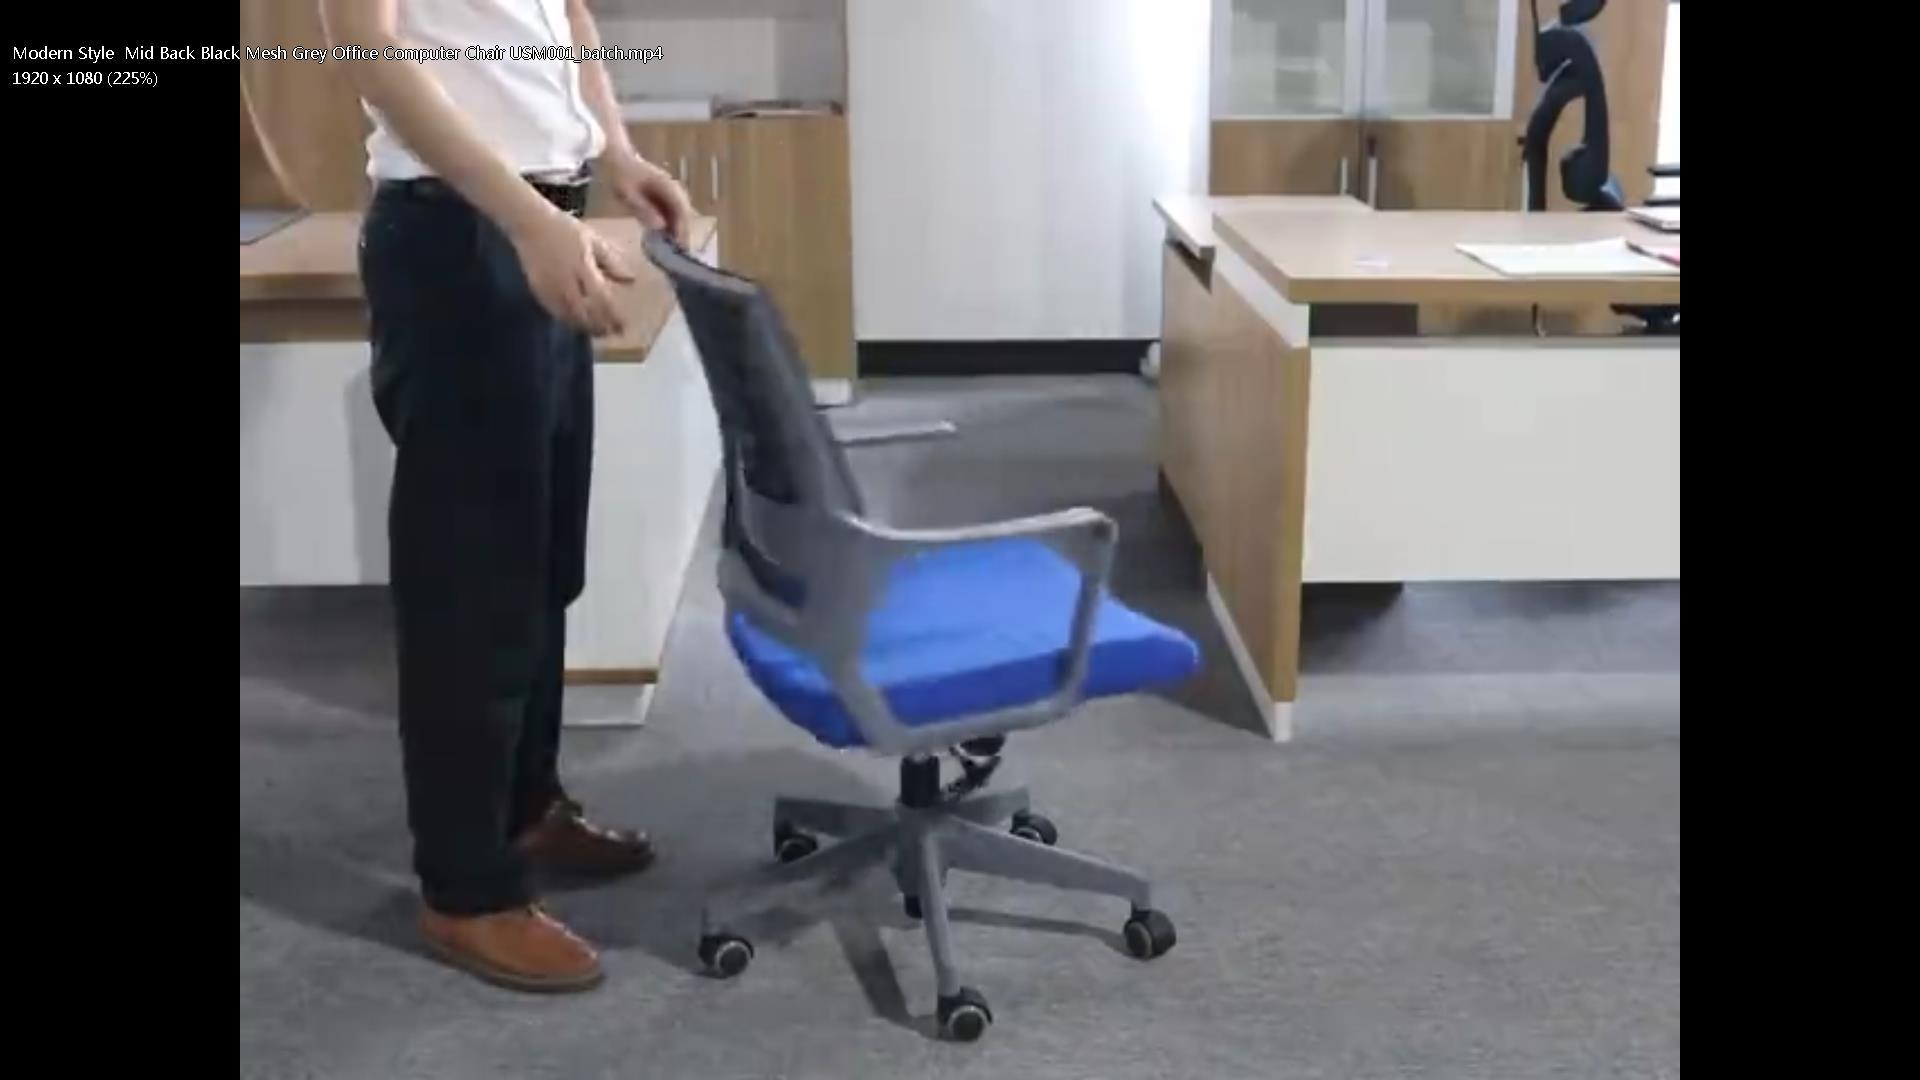 Modern Style  Mid Back Black Mesh Grey Office Computer Chair USM001